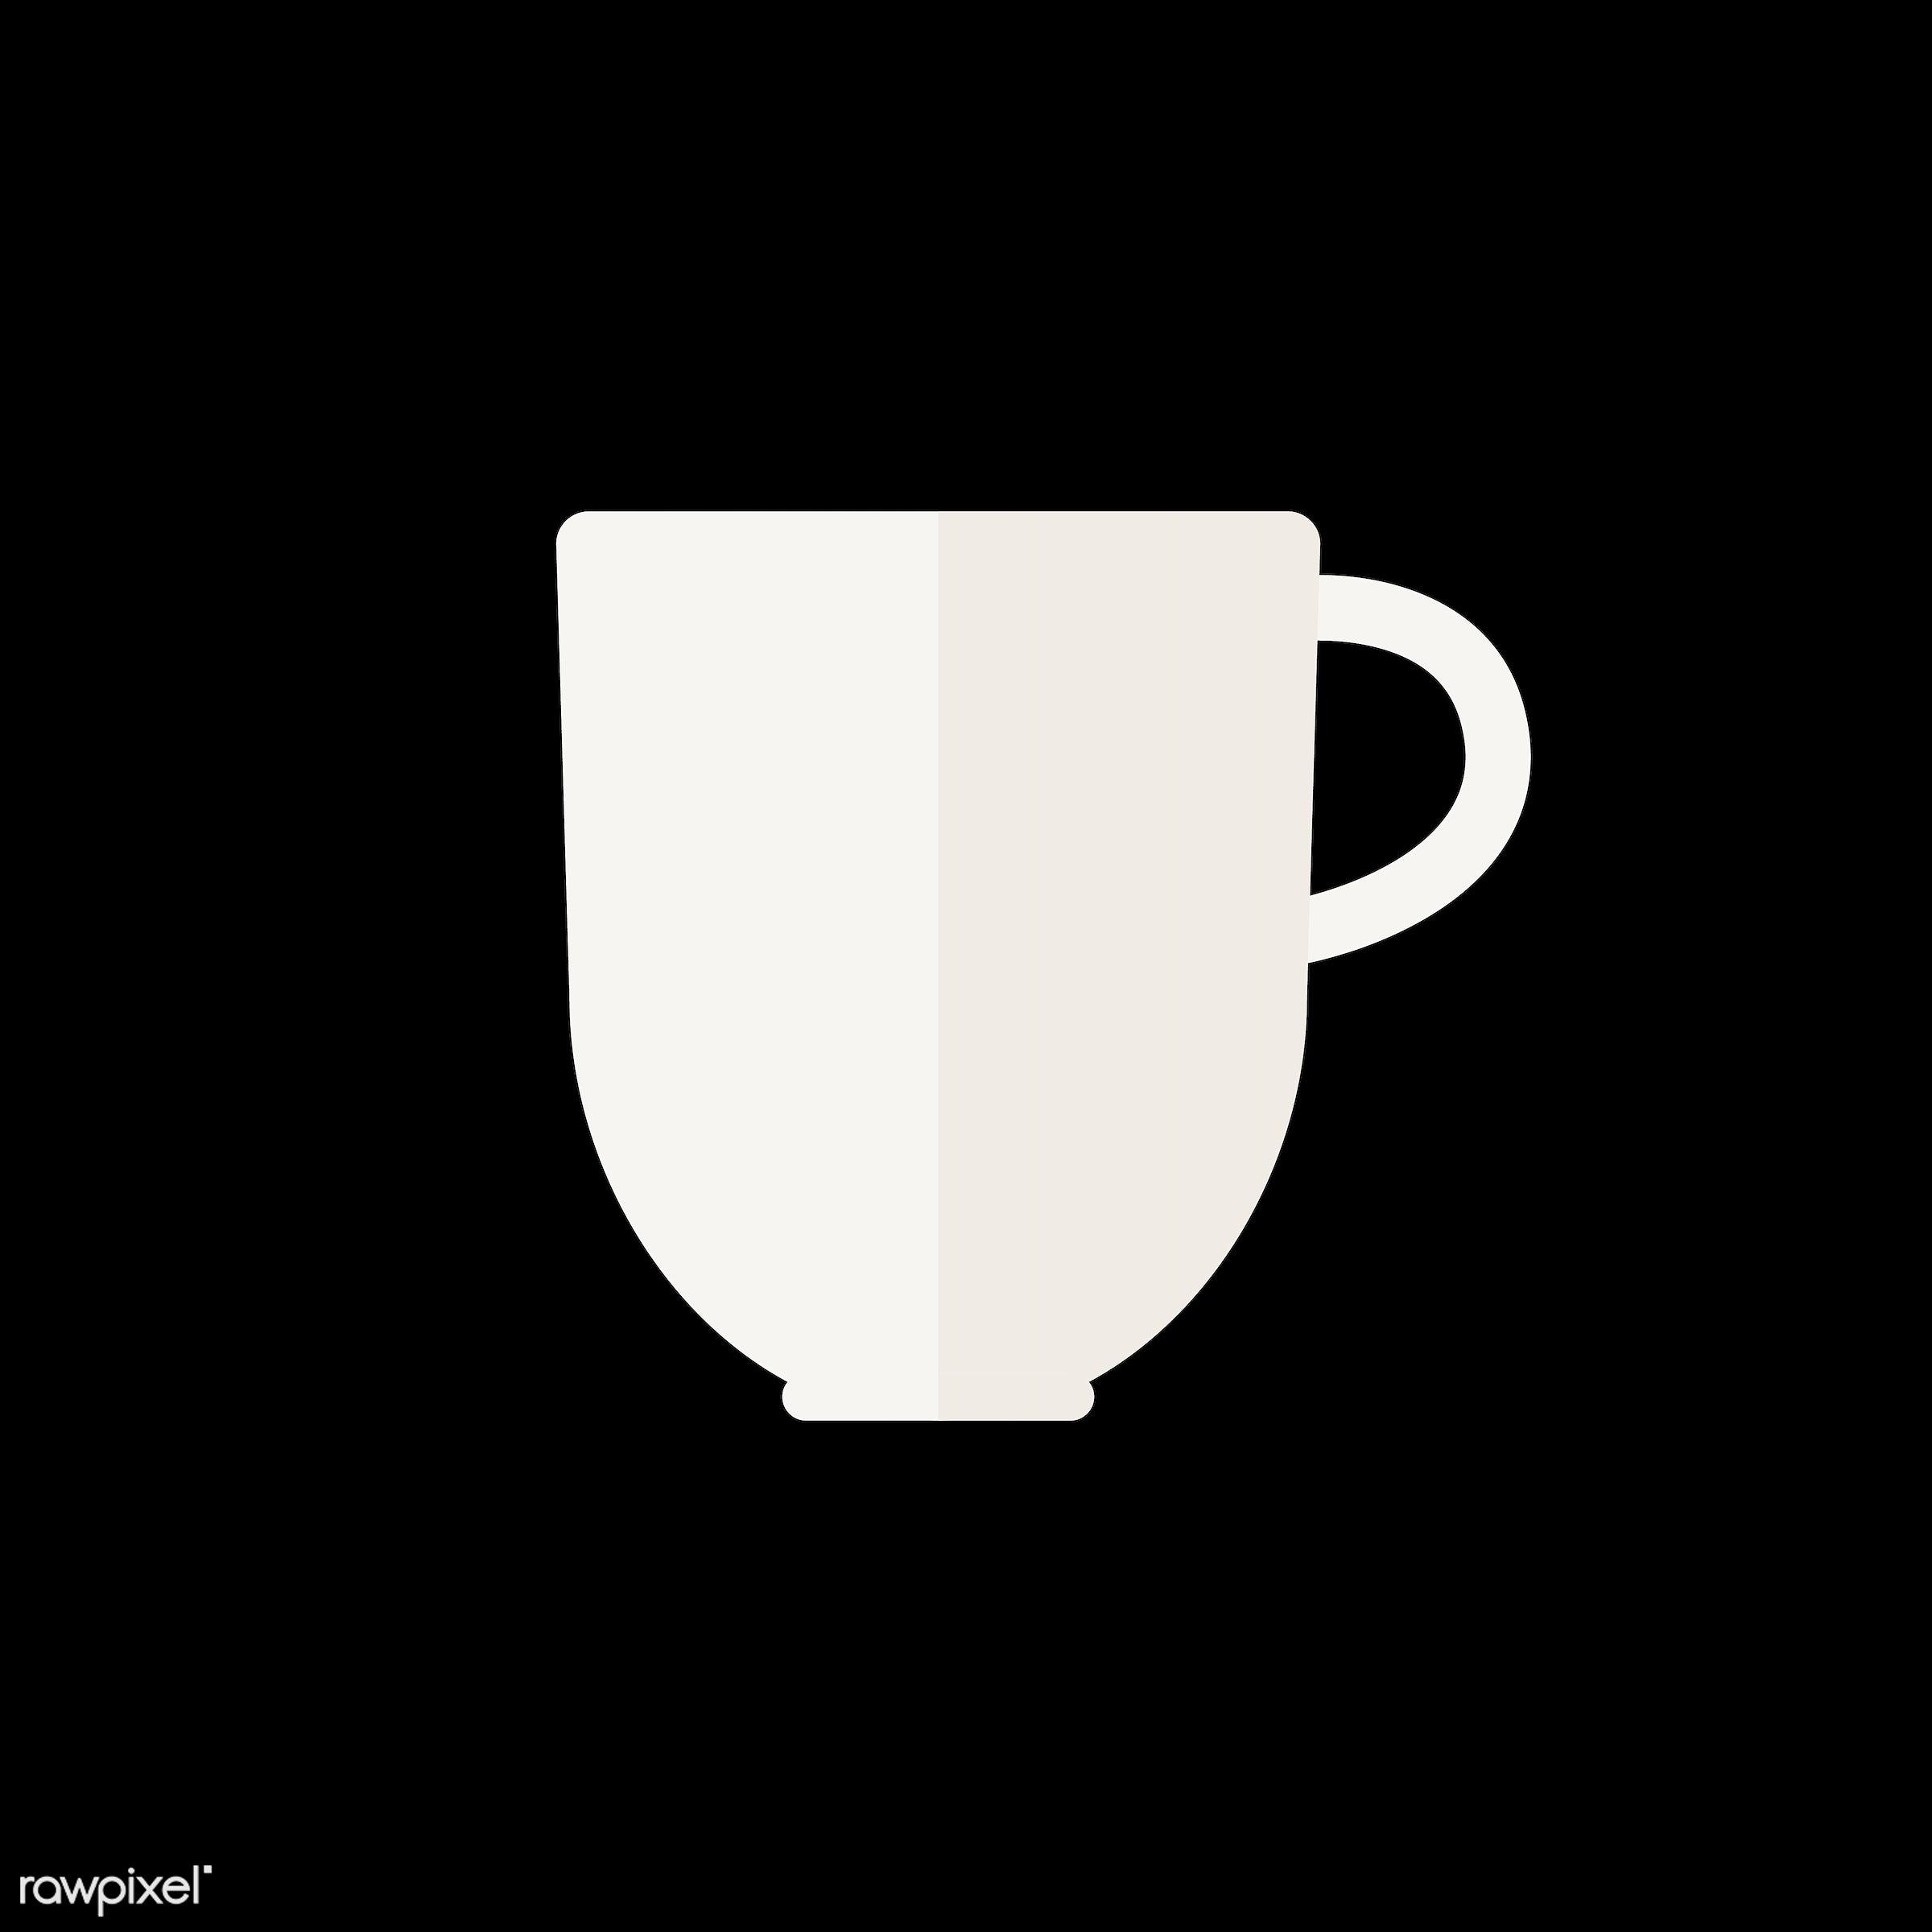 vector, graphic, illustration, icon, symbol, colorful, cute, drink, beverage, water, coffee, coffee cup, coffee mug, tea,...